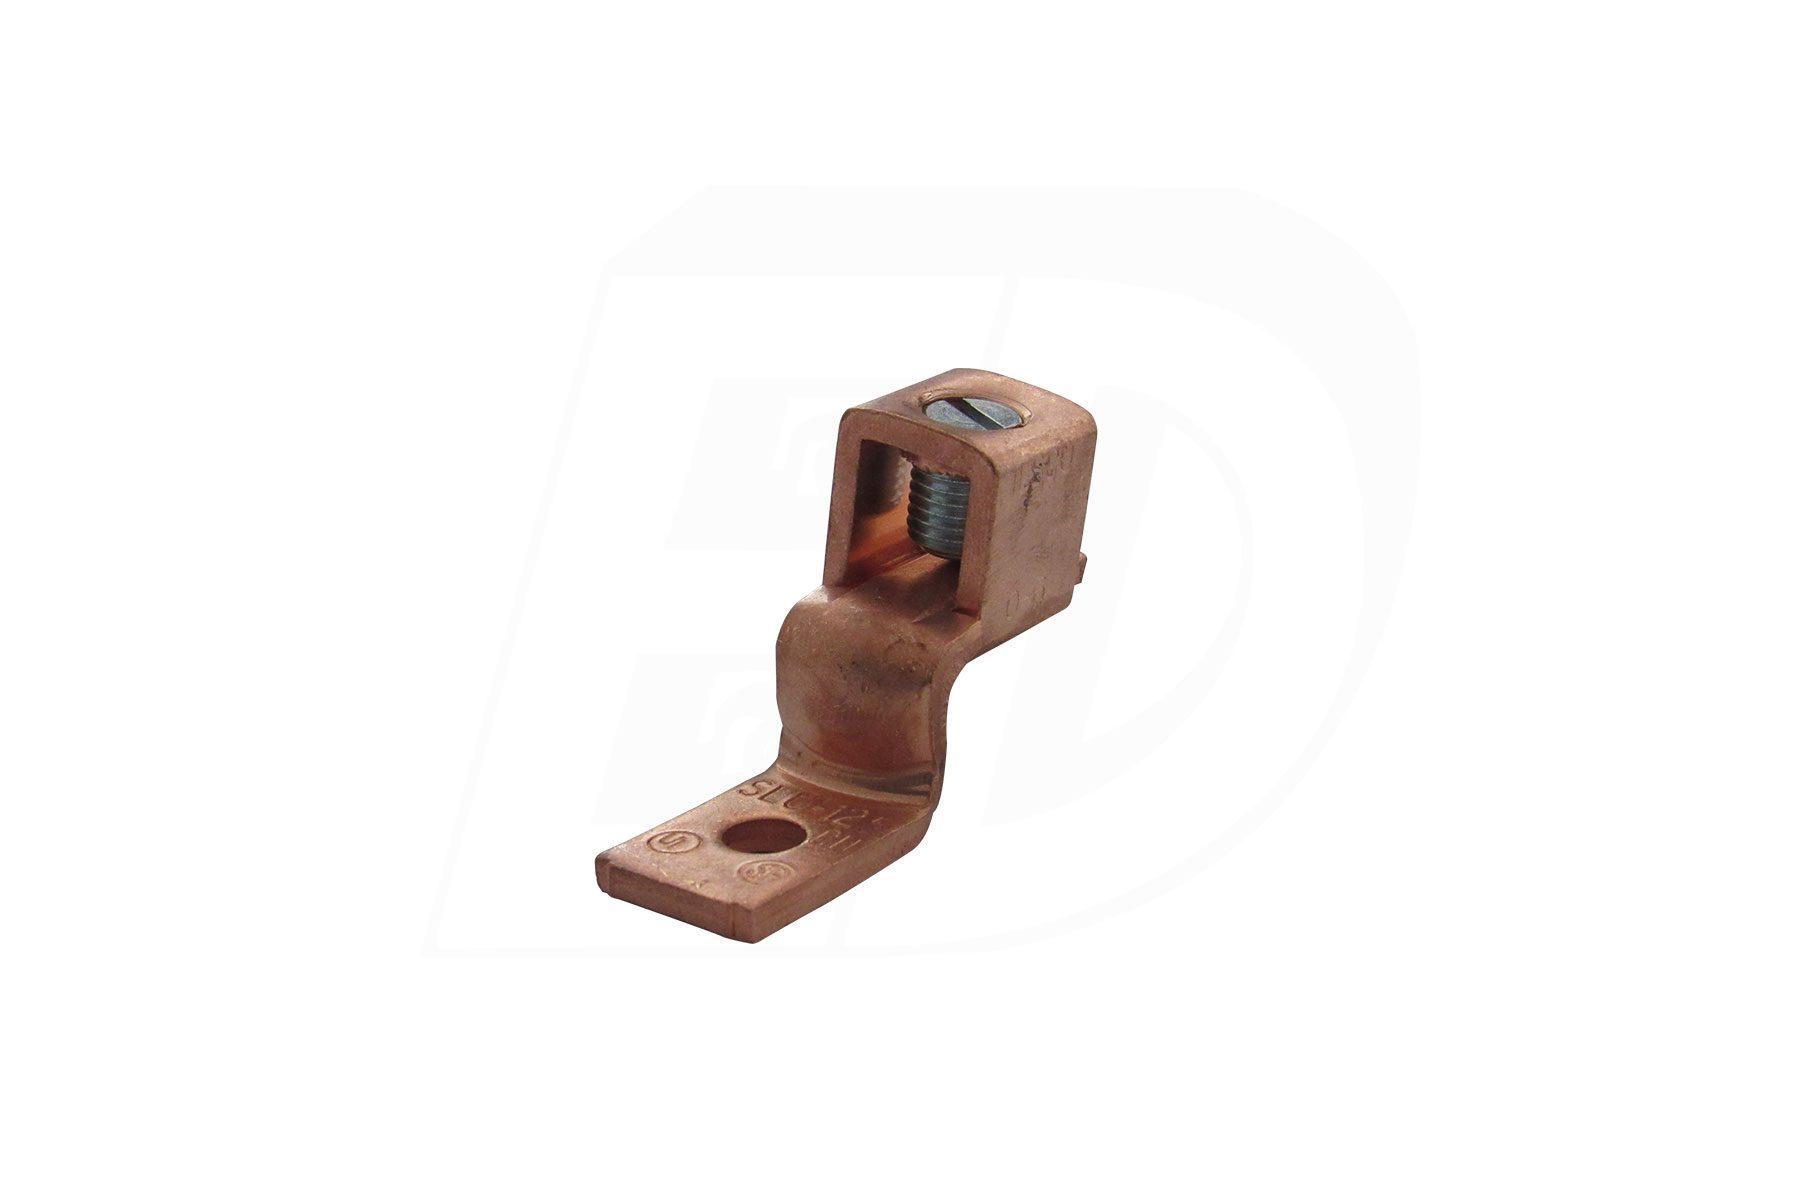 Solderless Copper Mechanical Lug